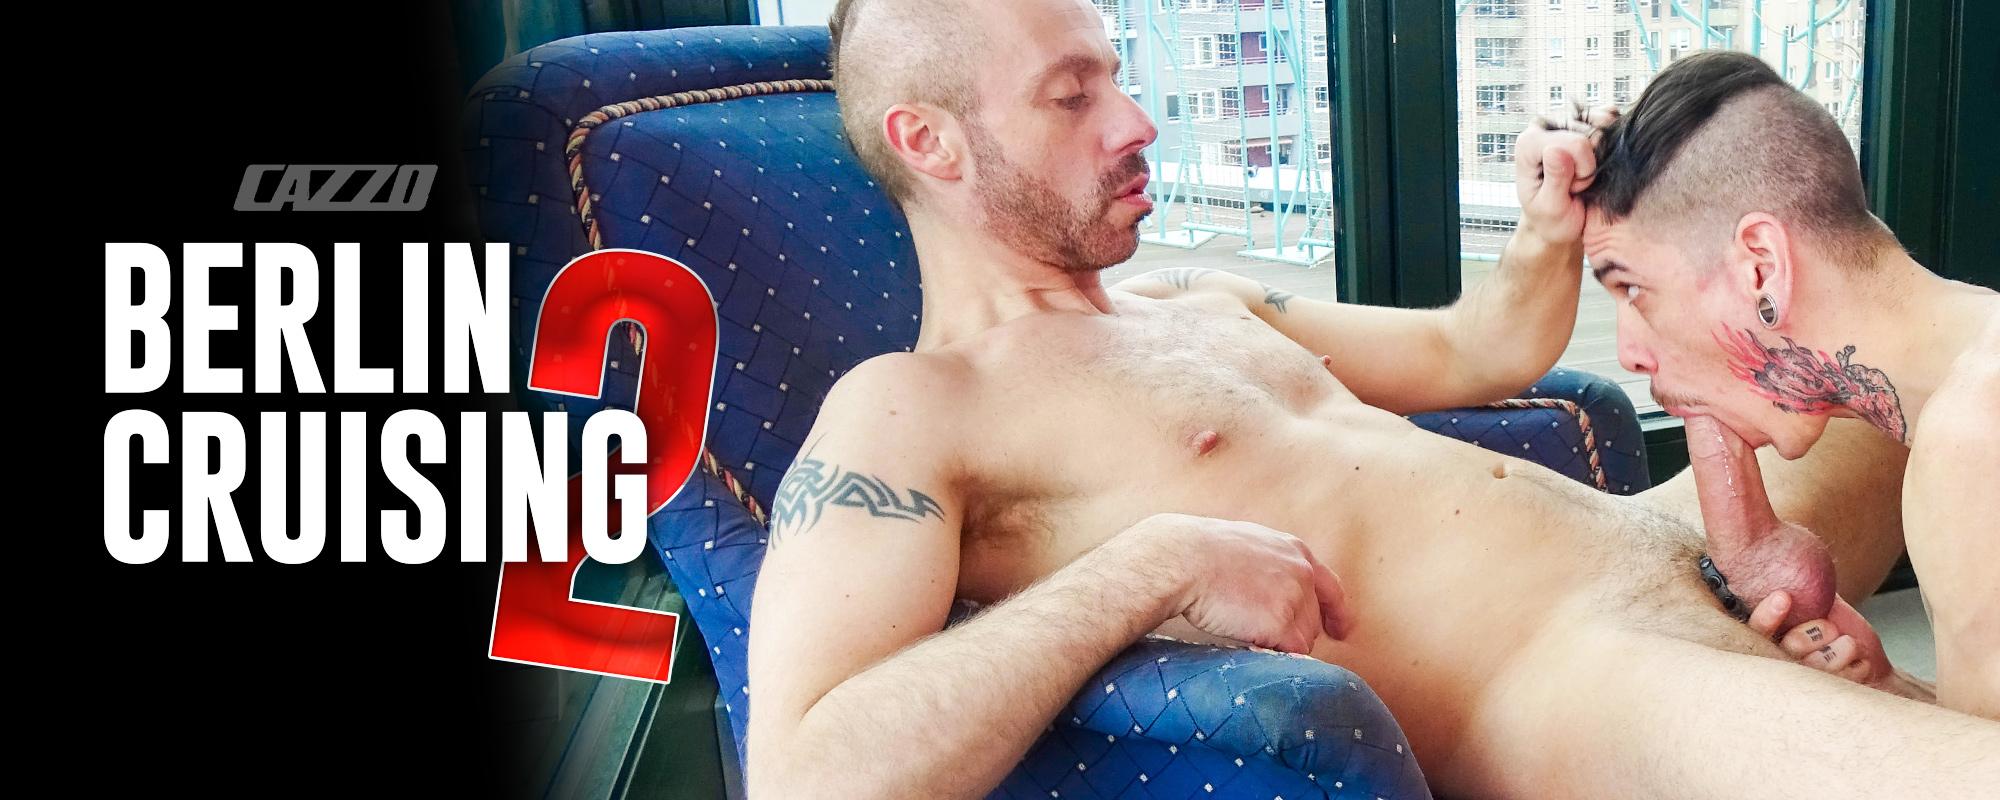 Cazzo: Berlin Cruising 2